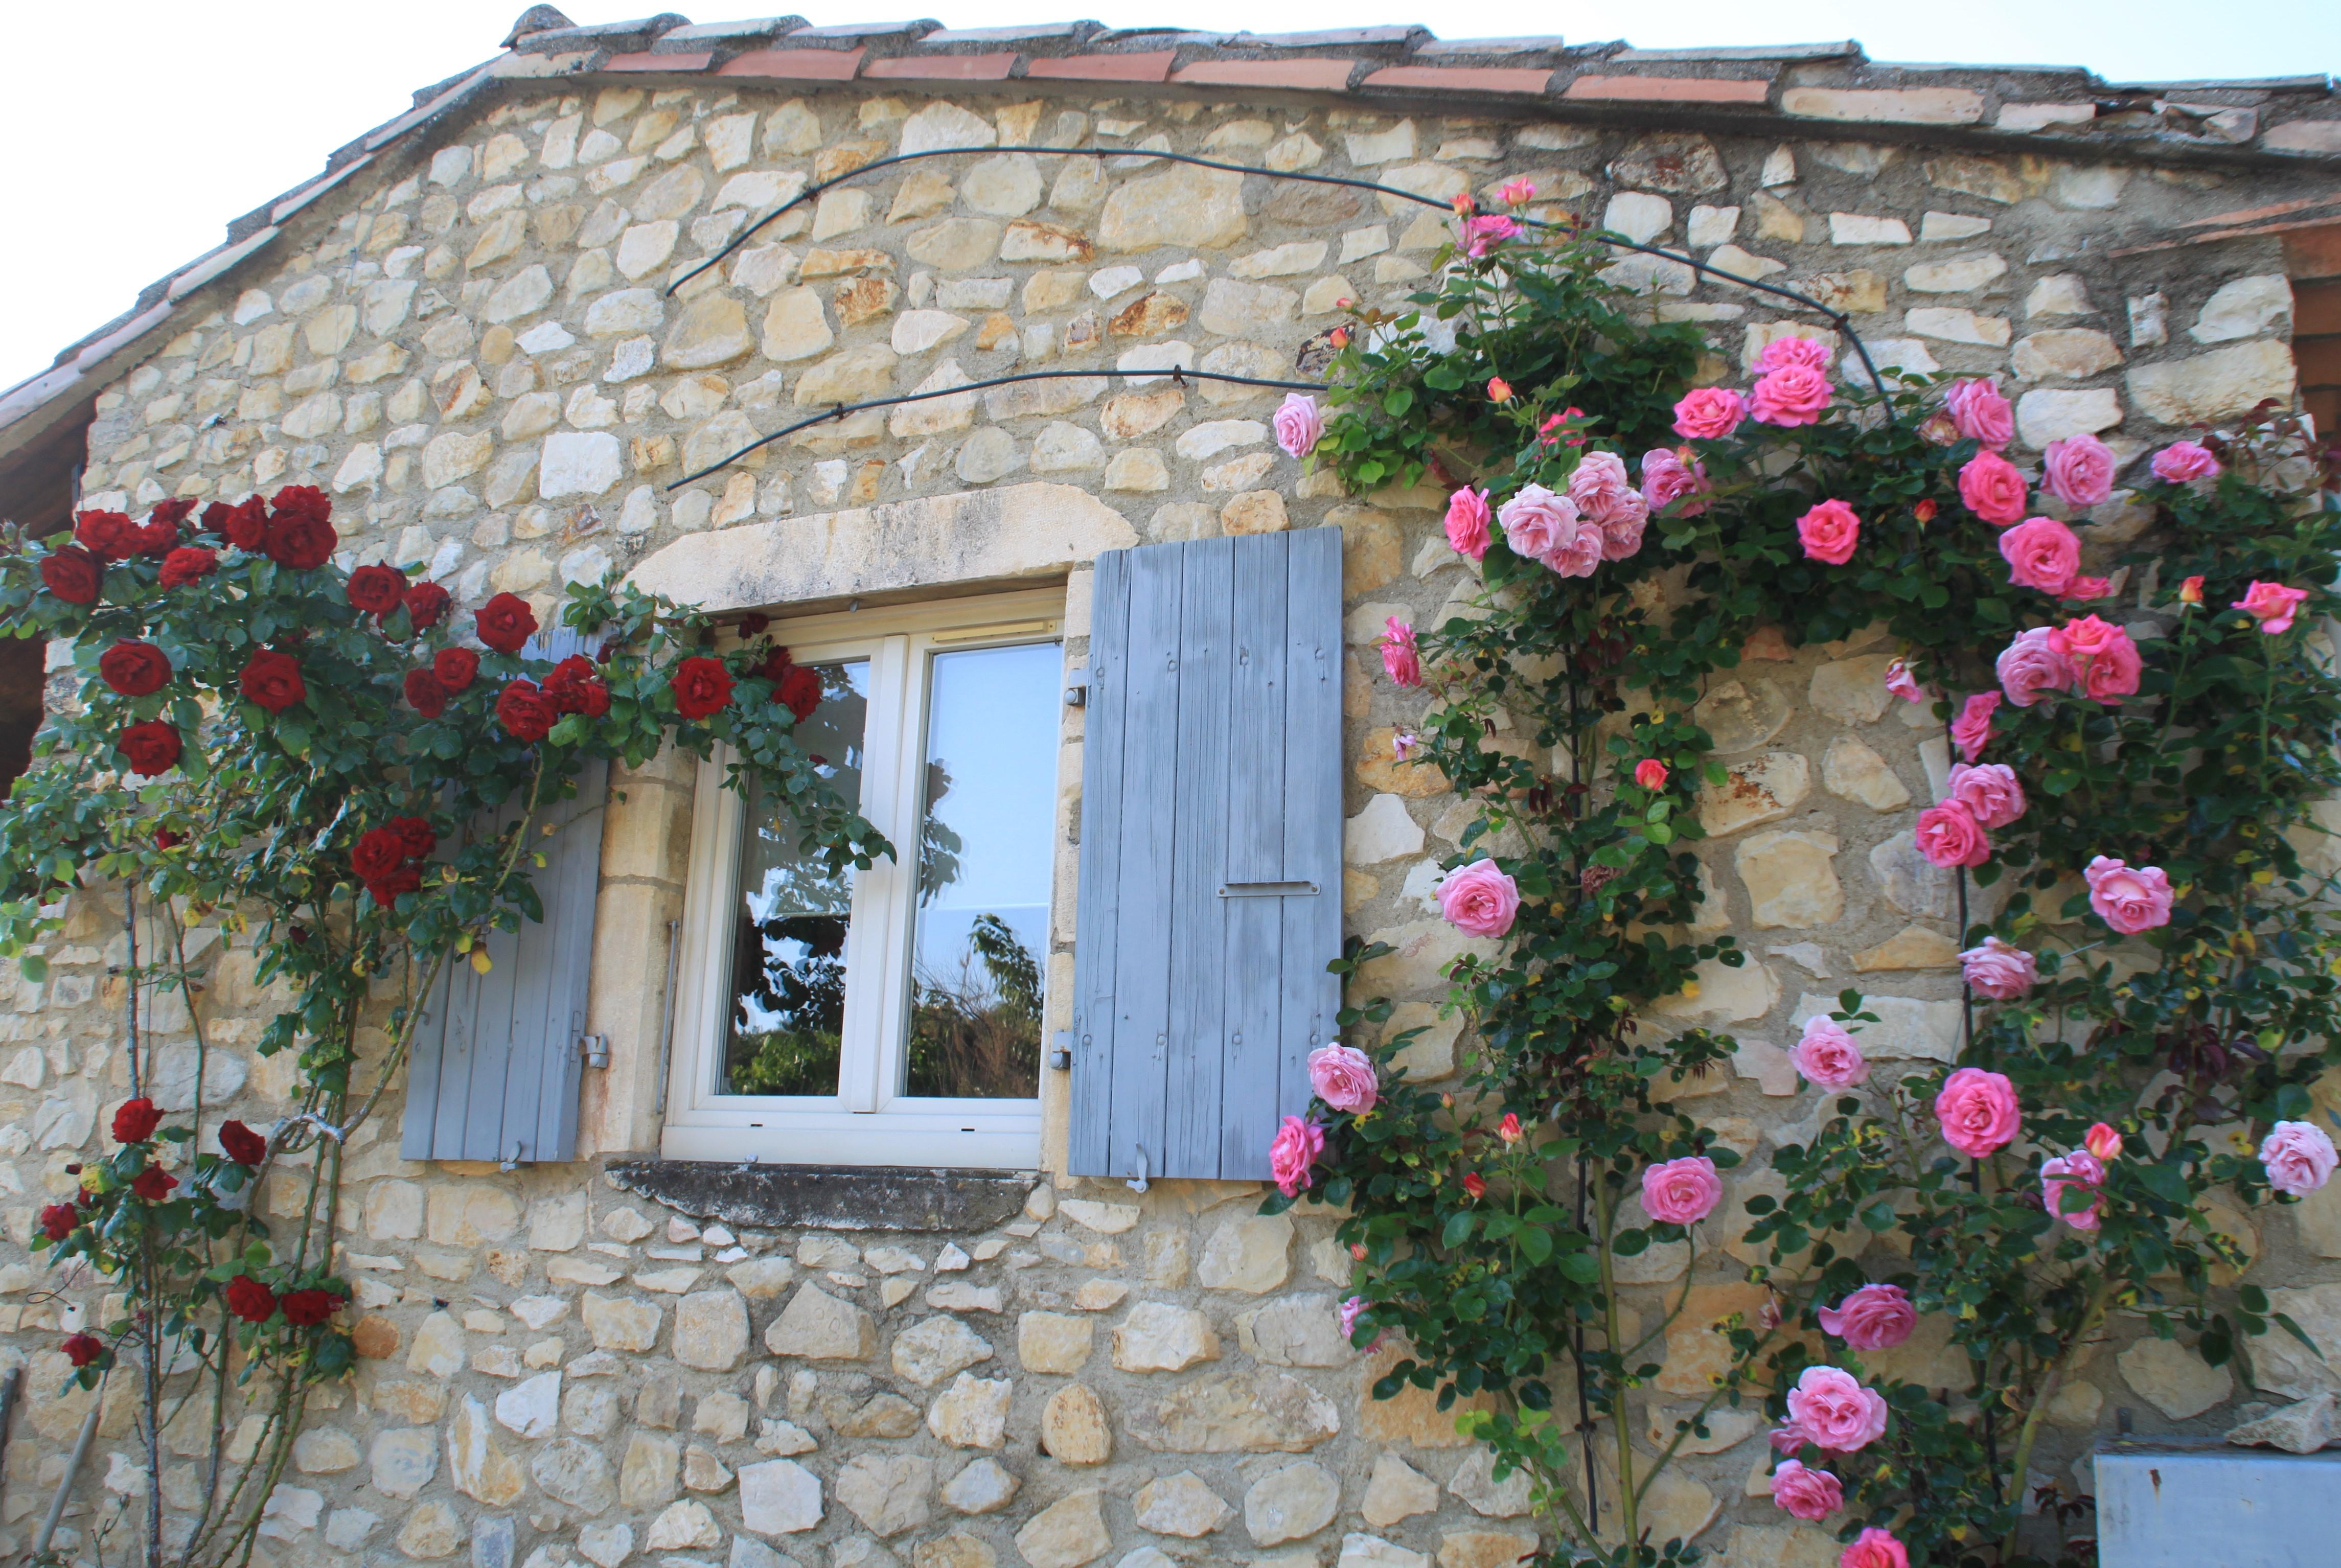 Les rosiers en fleurs